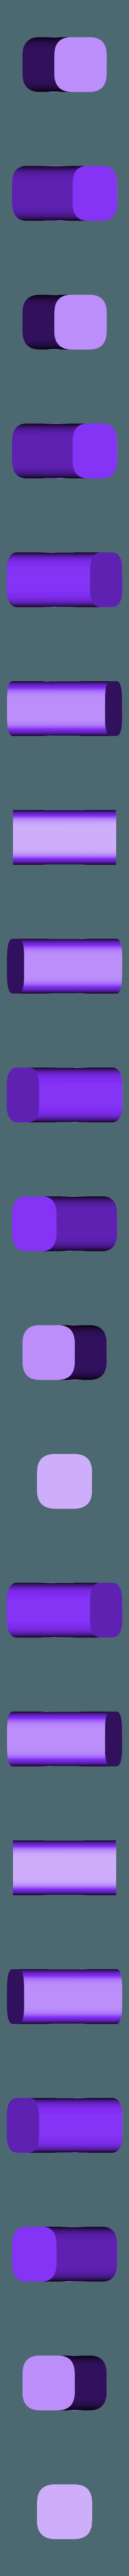 Hammer_v1-3_SMALL_HEAD.STL Télécharger fichier STL gratuit Marteau • Objet à imprimer en 3D, WalterHsiao